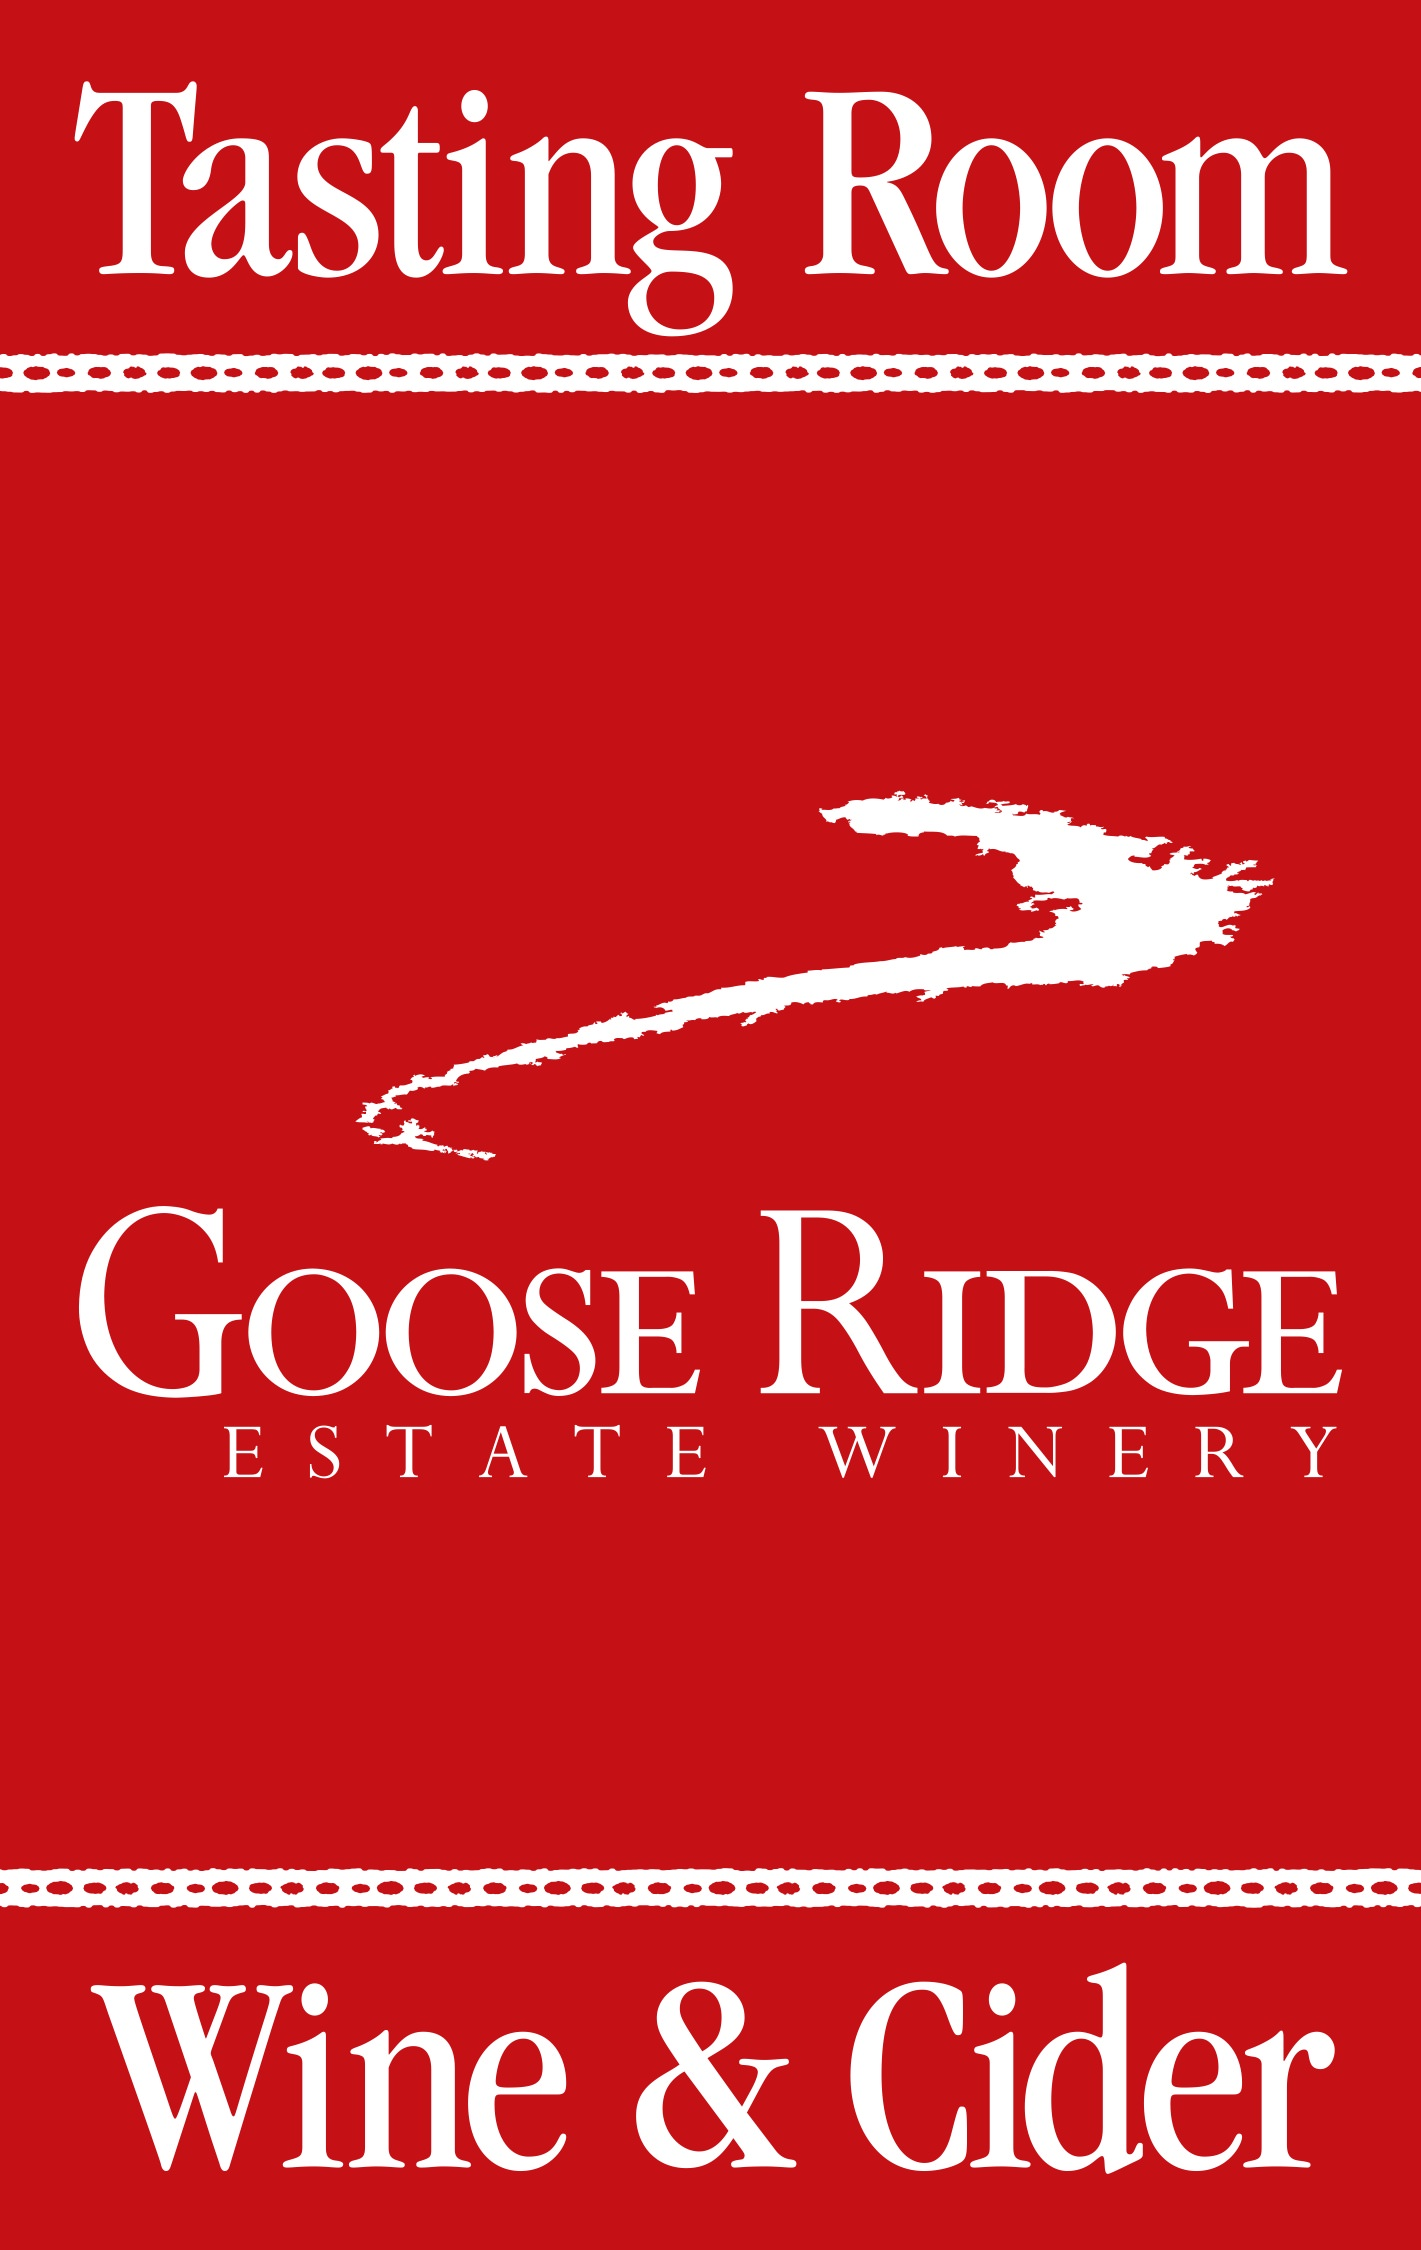 Goose Ridge Sign Options-3.jpg